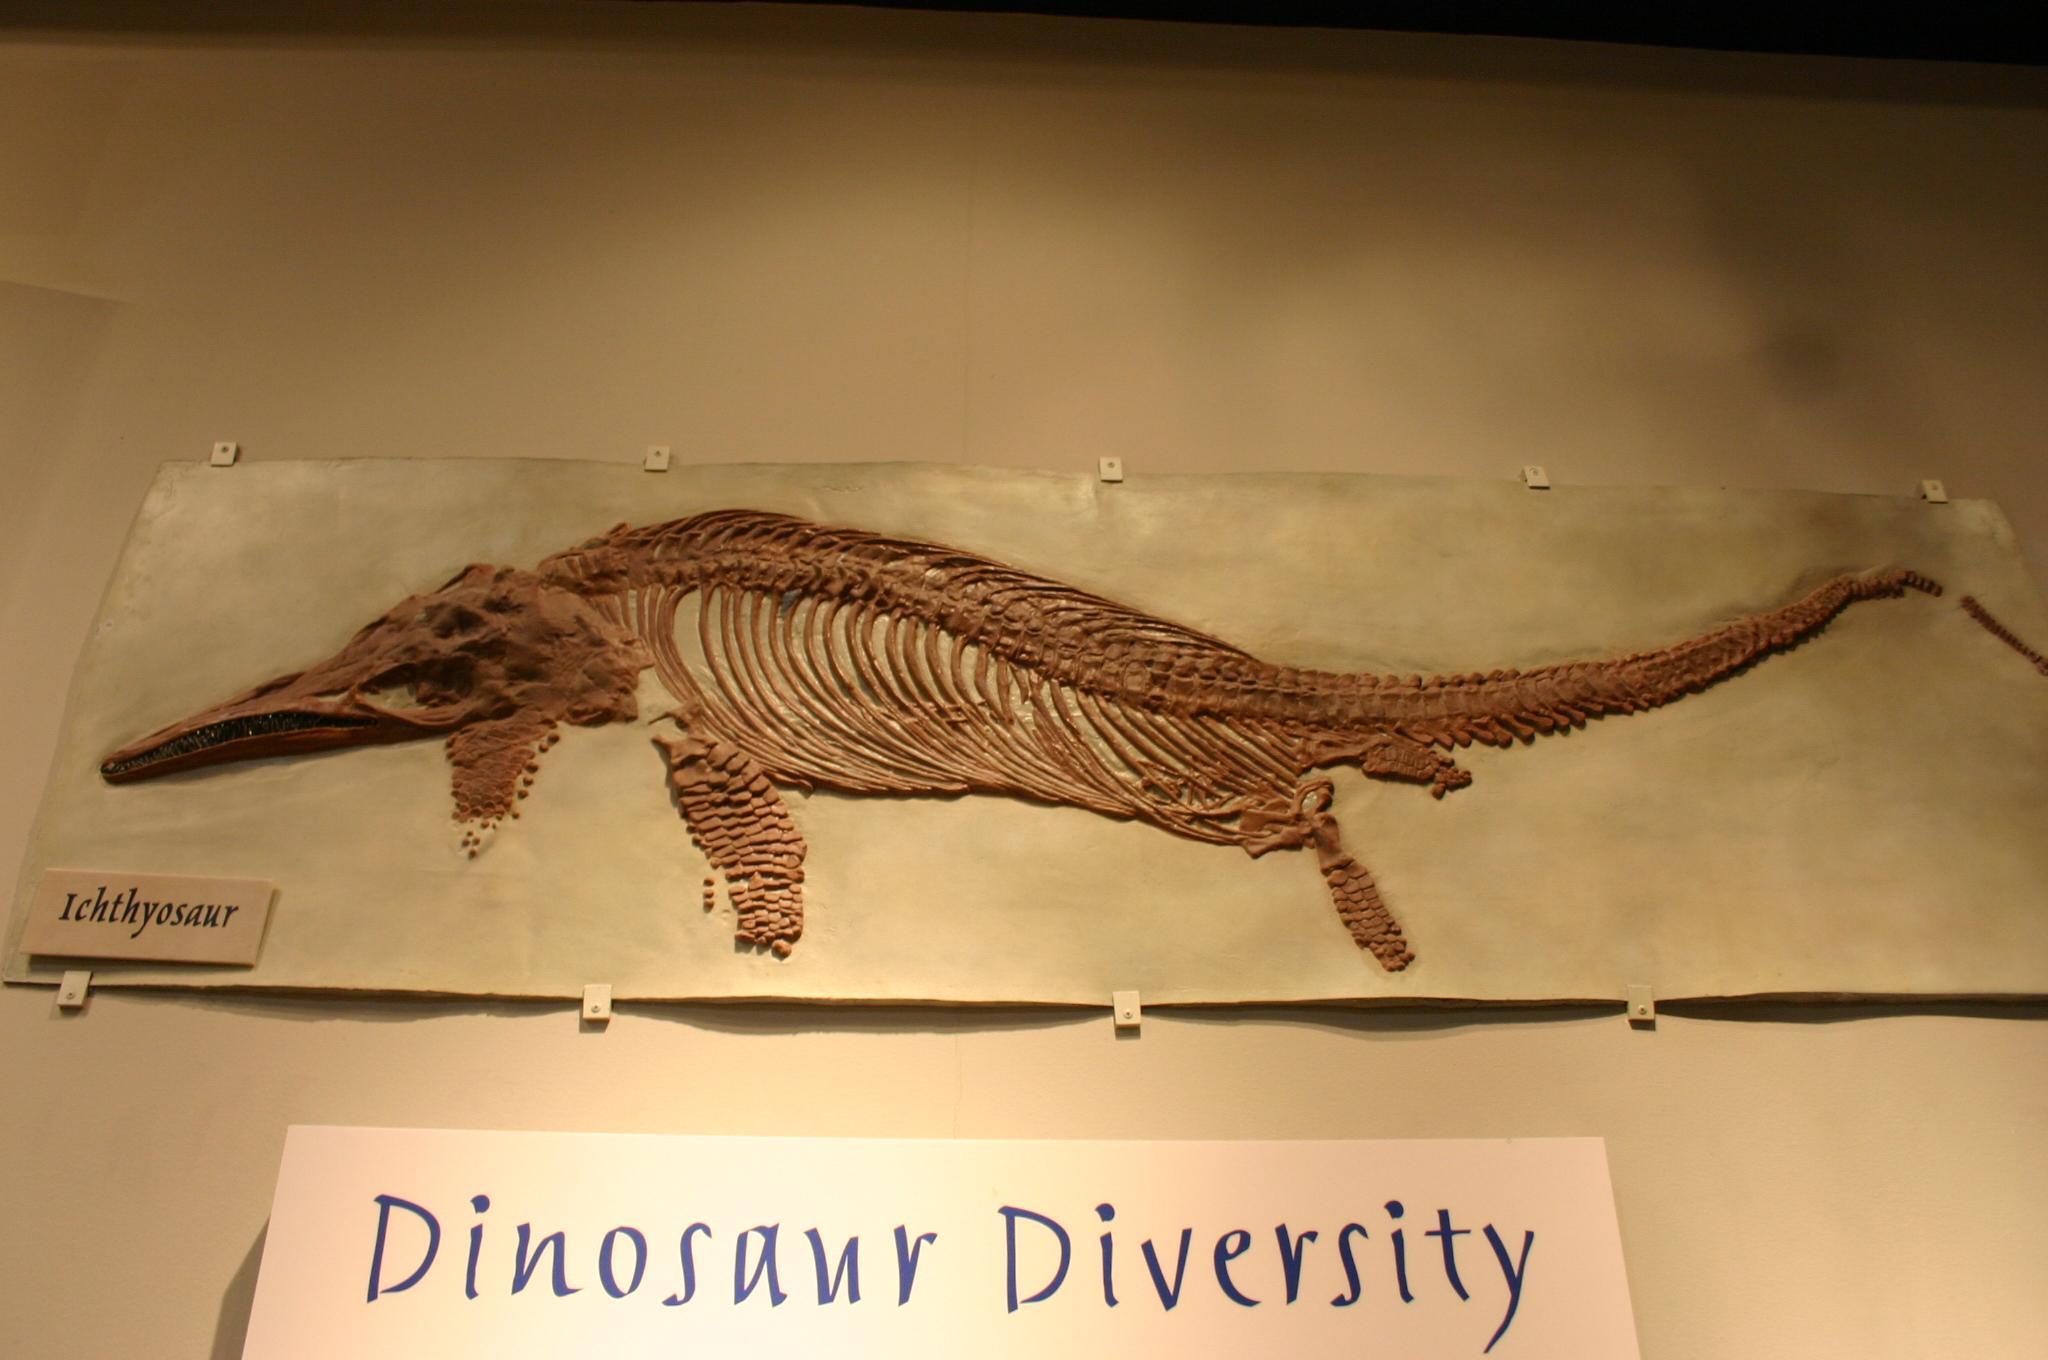 ichthyosaur fossil - photo #1